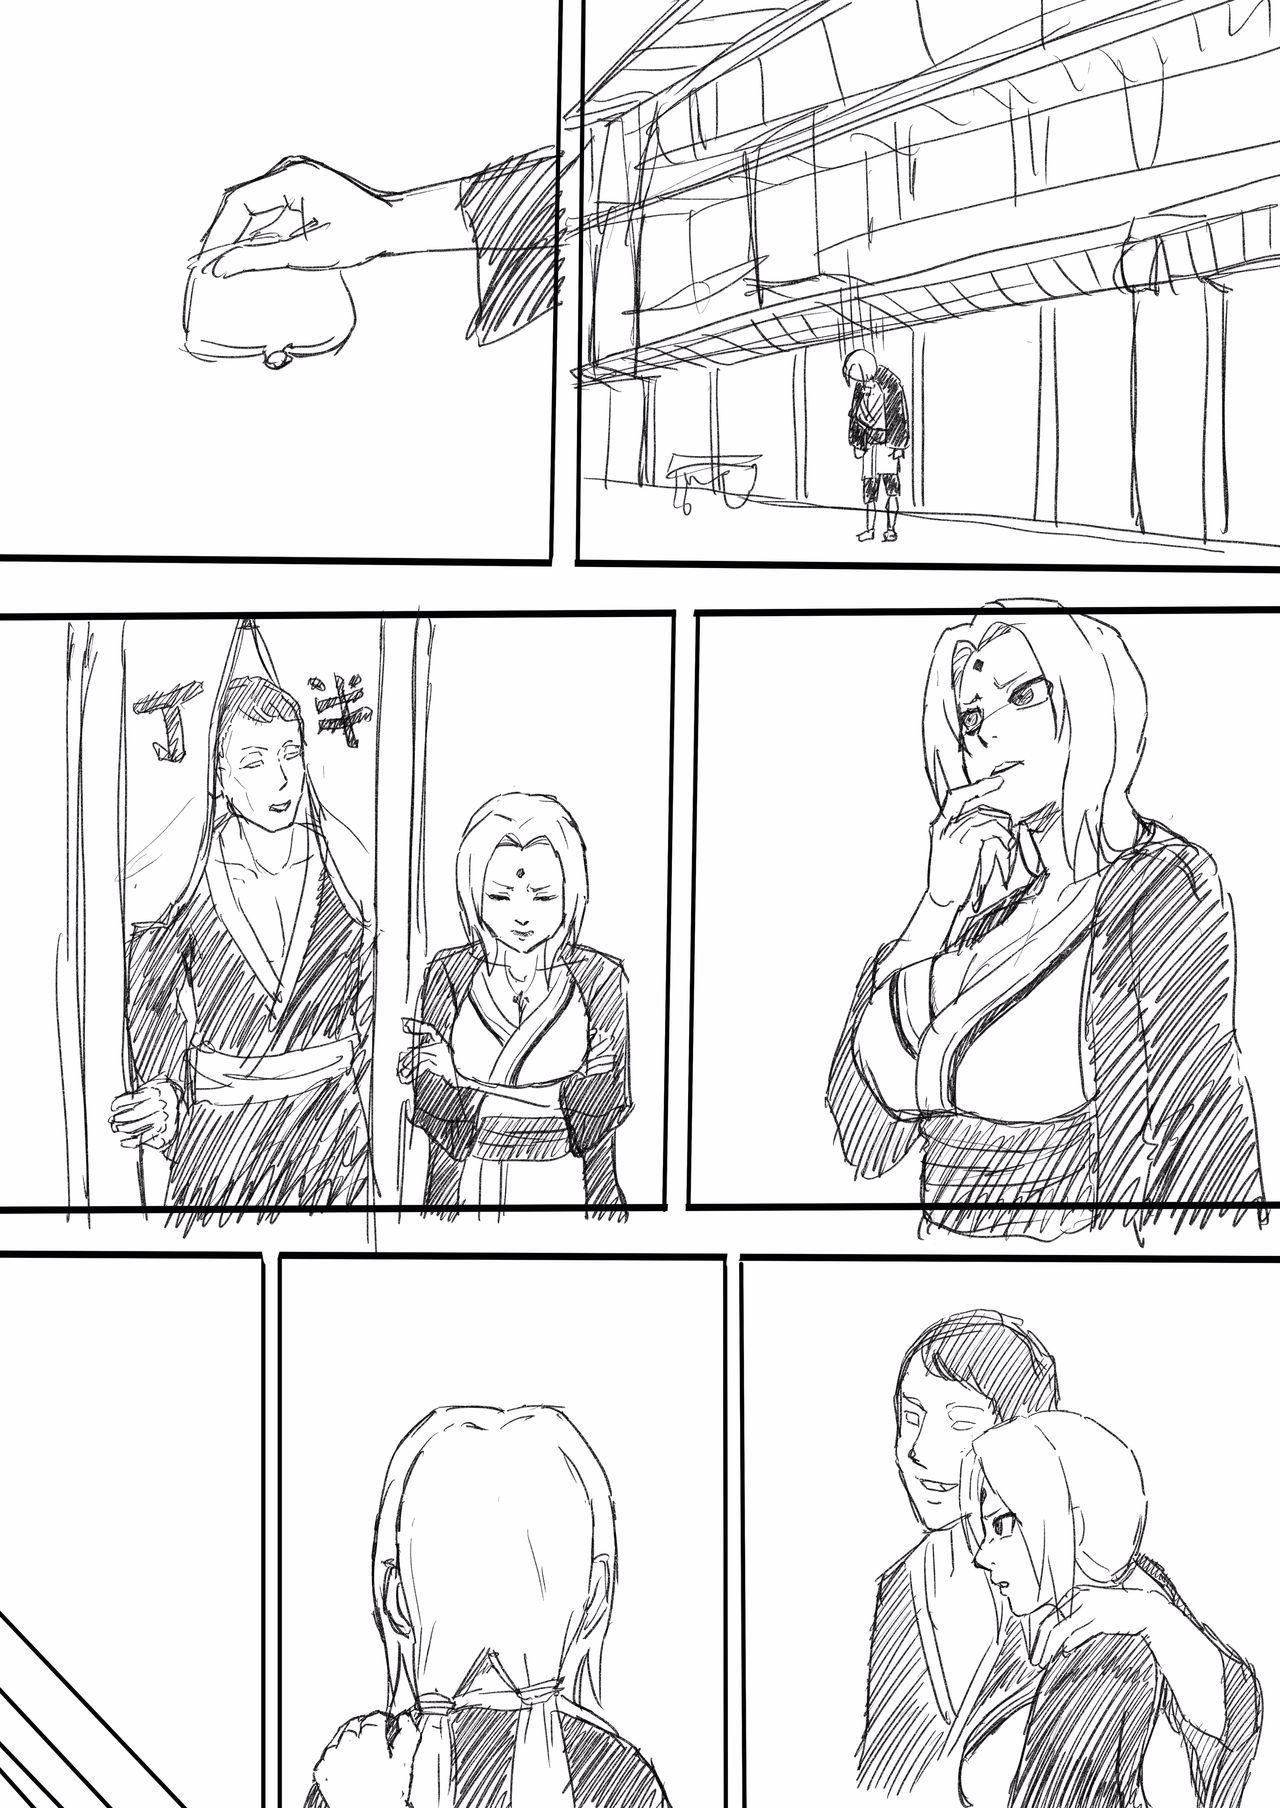 [Iwao] Te Ero Manga (Naruto) Updated 0